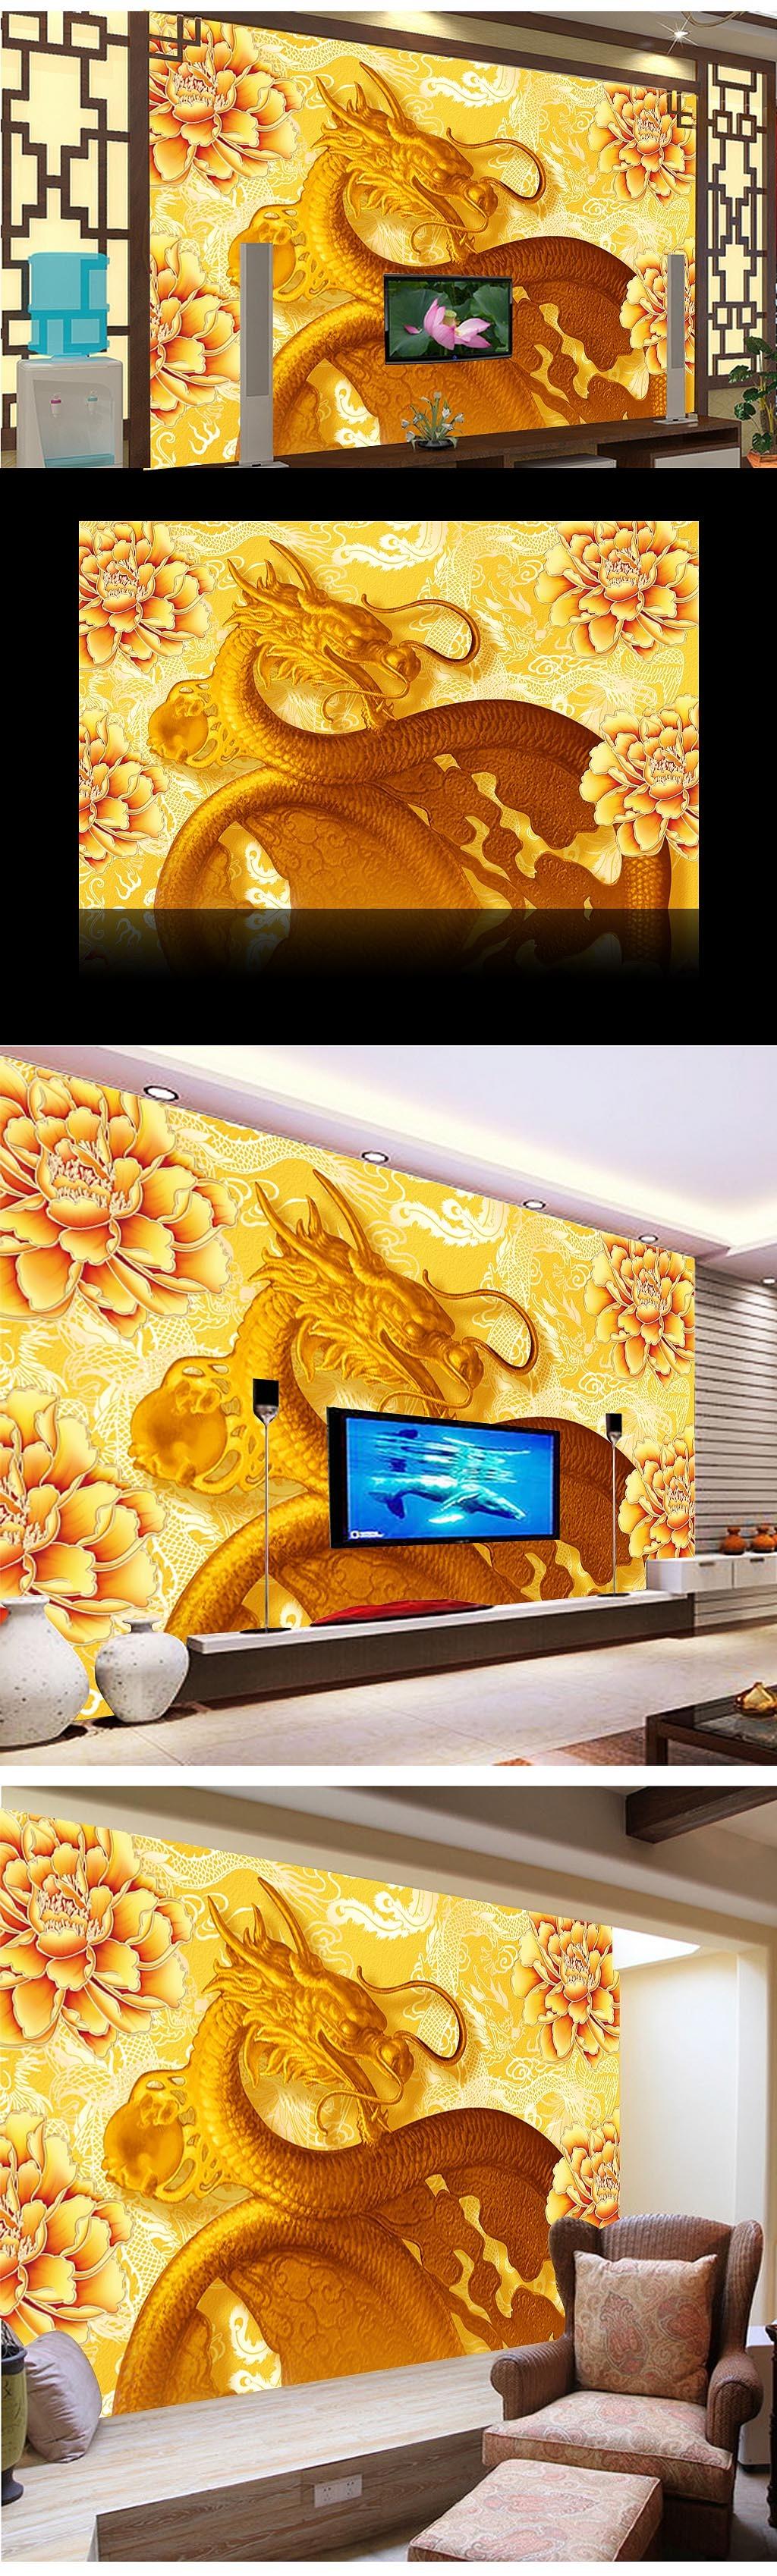 3d龙电视背景墙